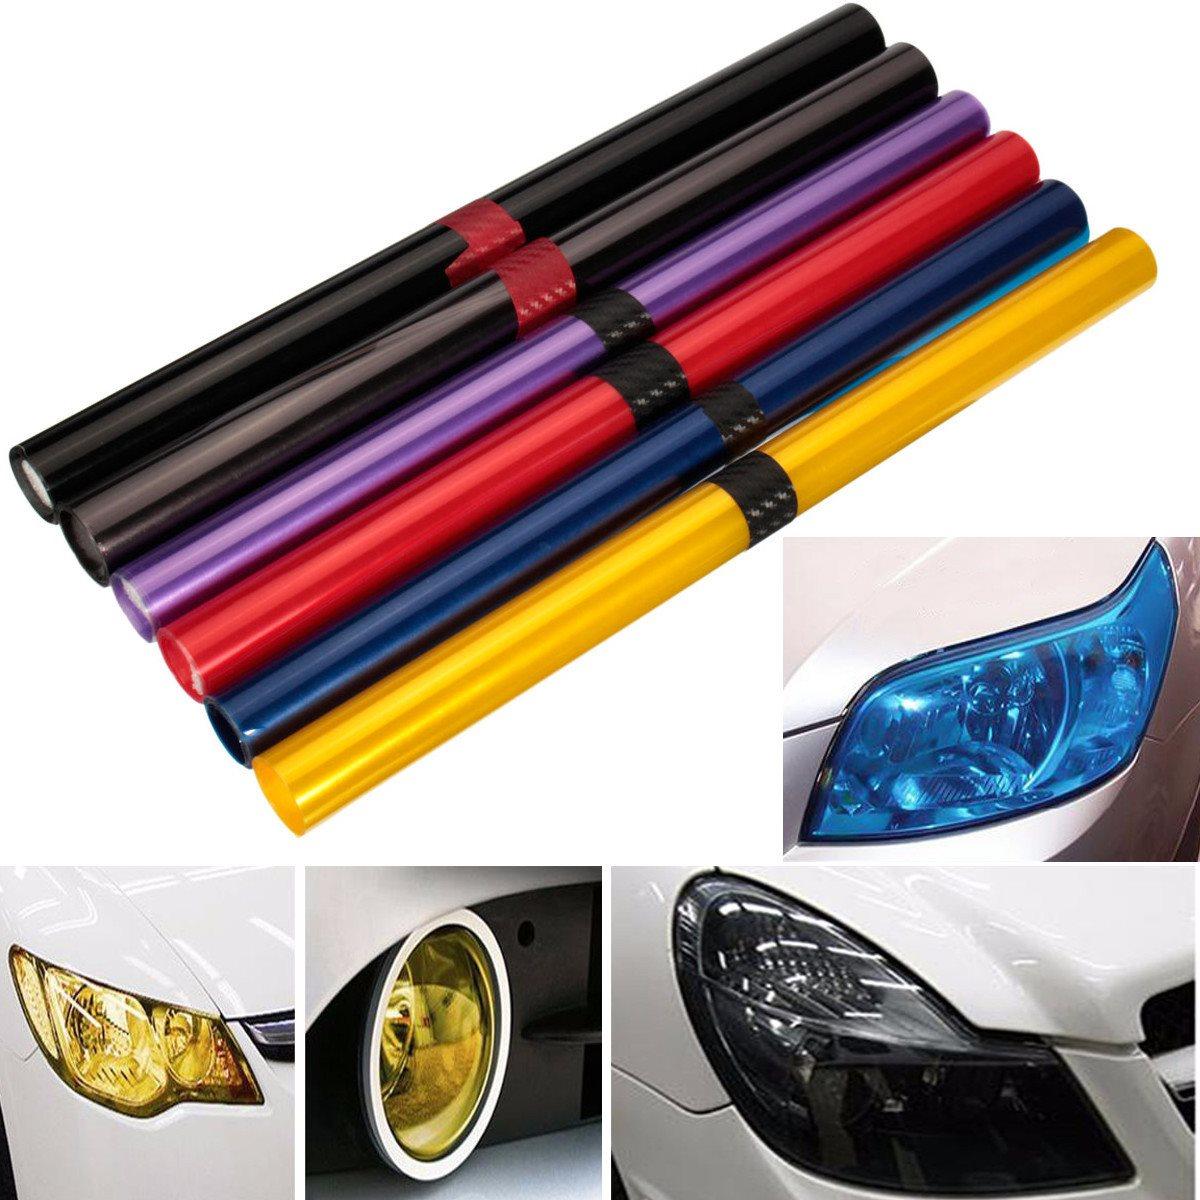 16 inch x48 inch car vehicle shade taillight headlight pvc for Pvc car